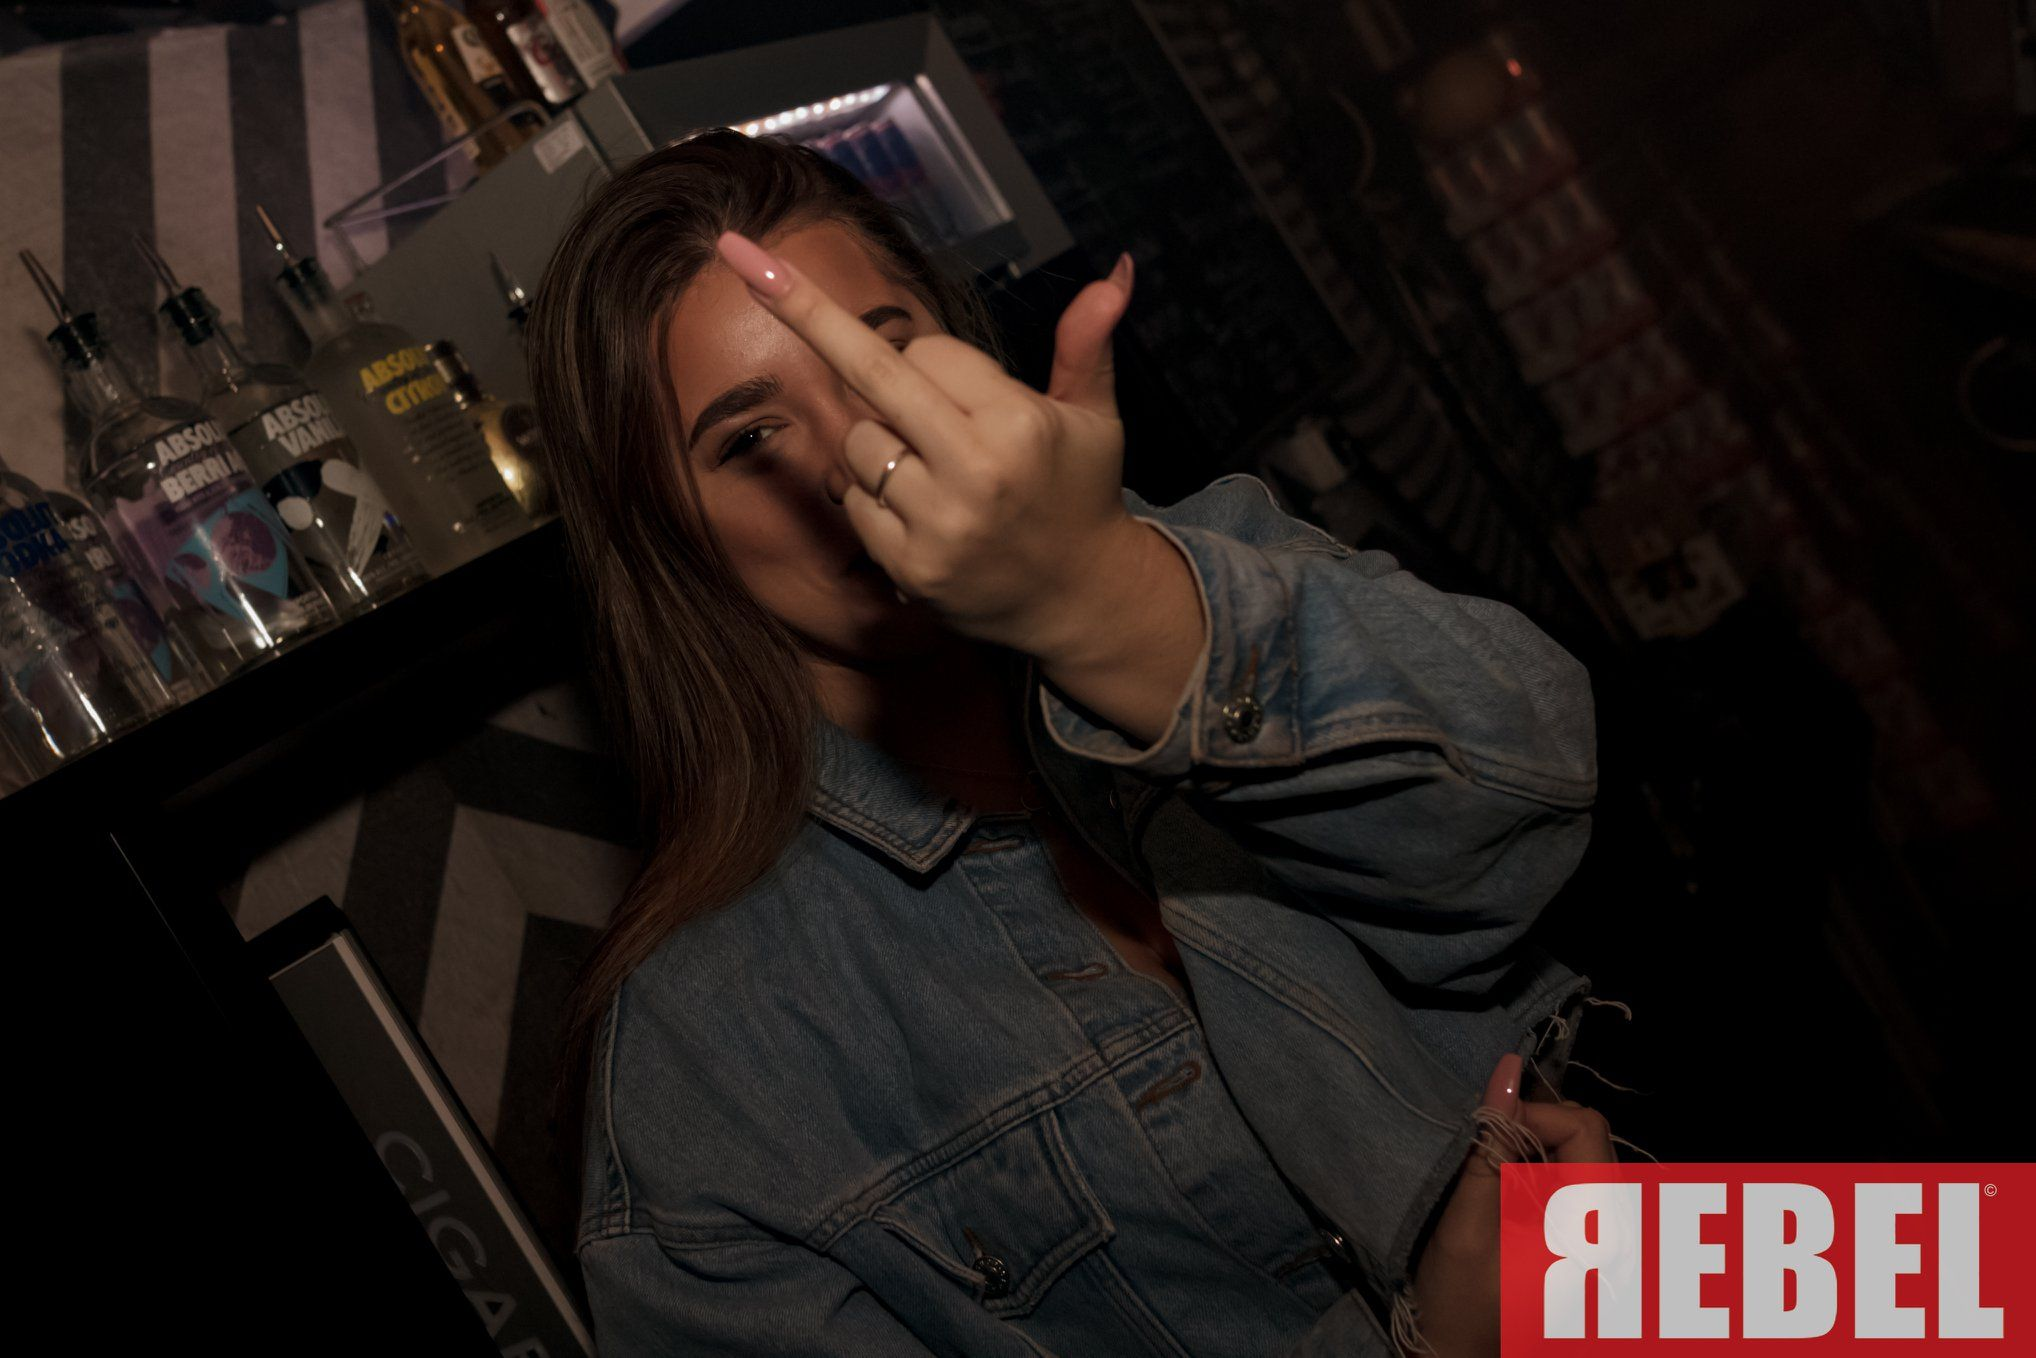 Image may contain: Pub, Bar Counter, Finger, Person, Human